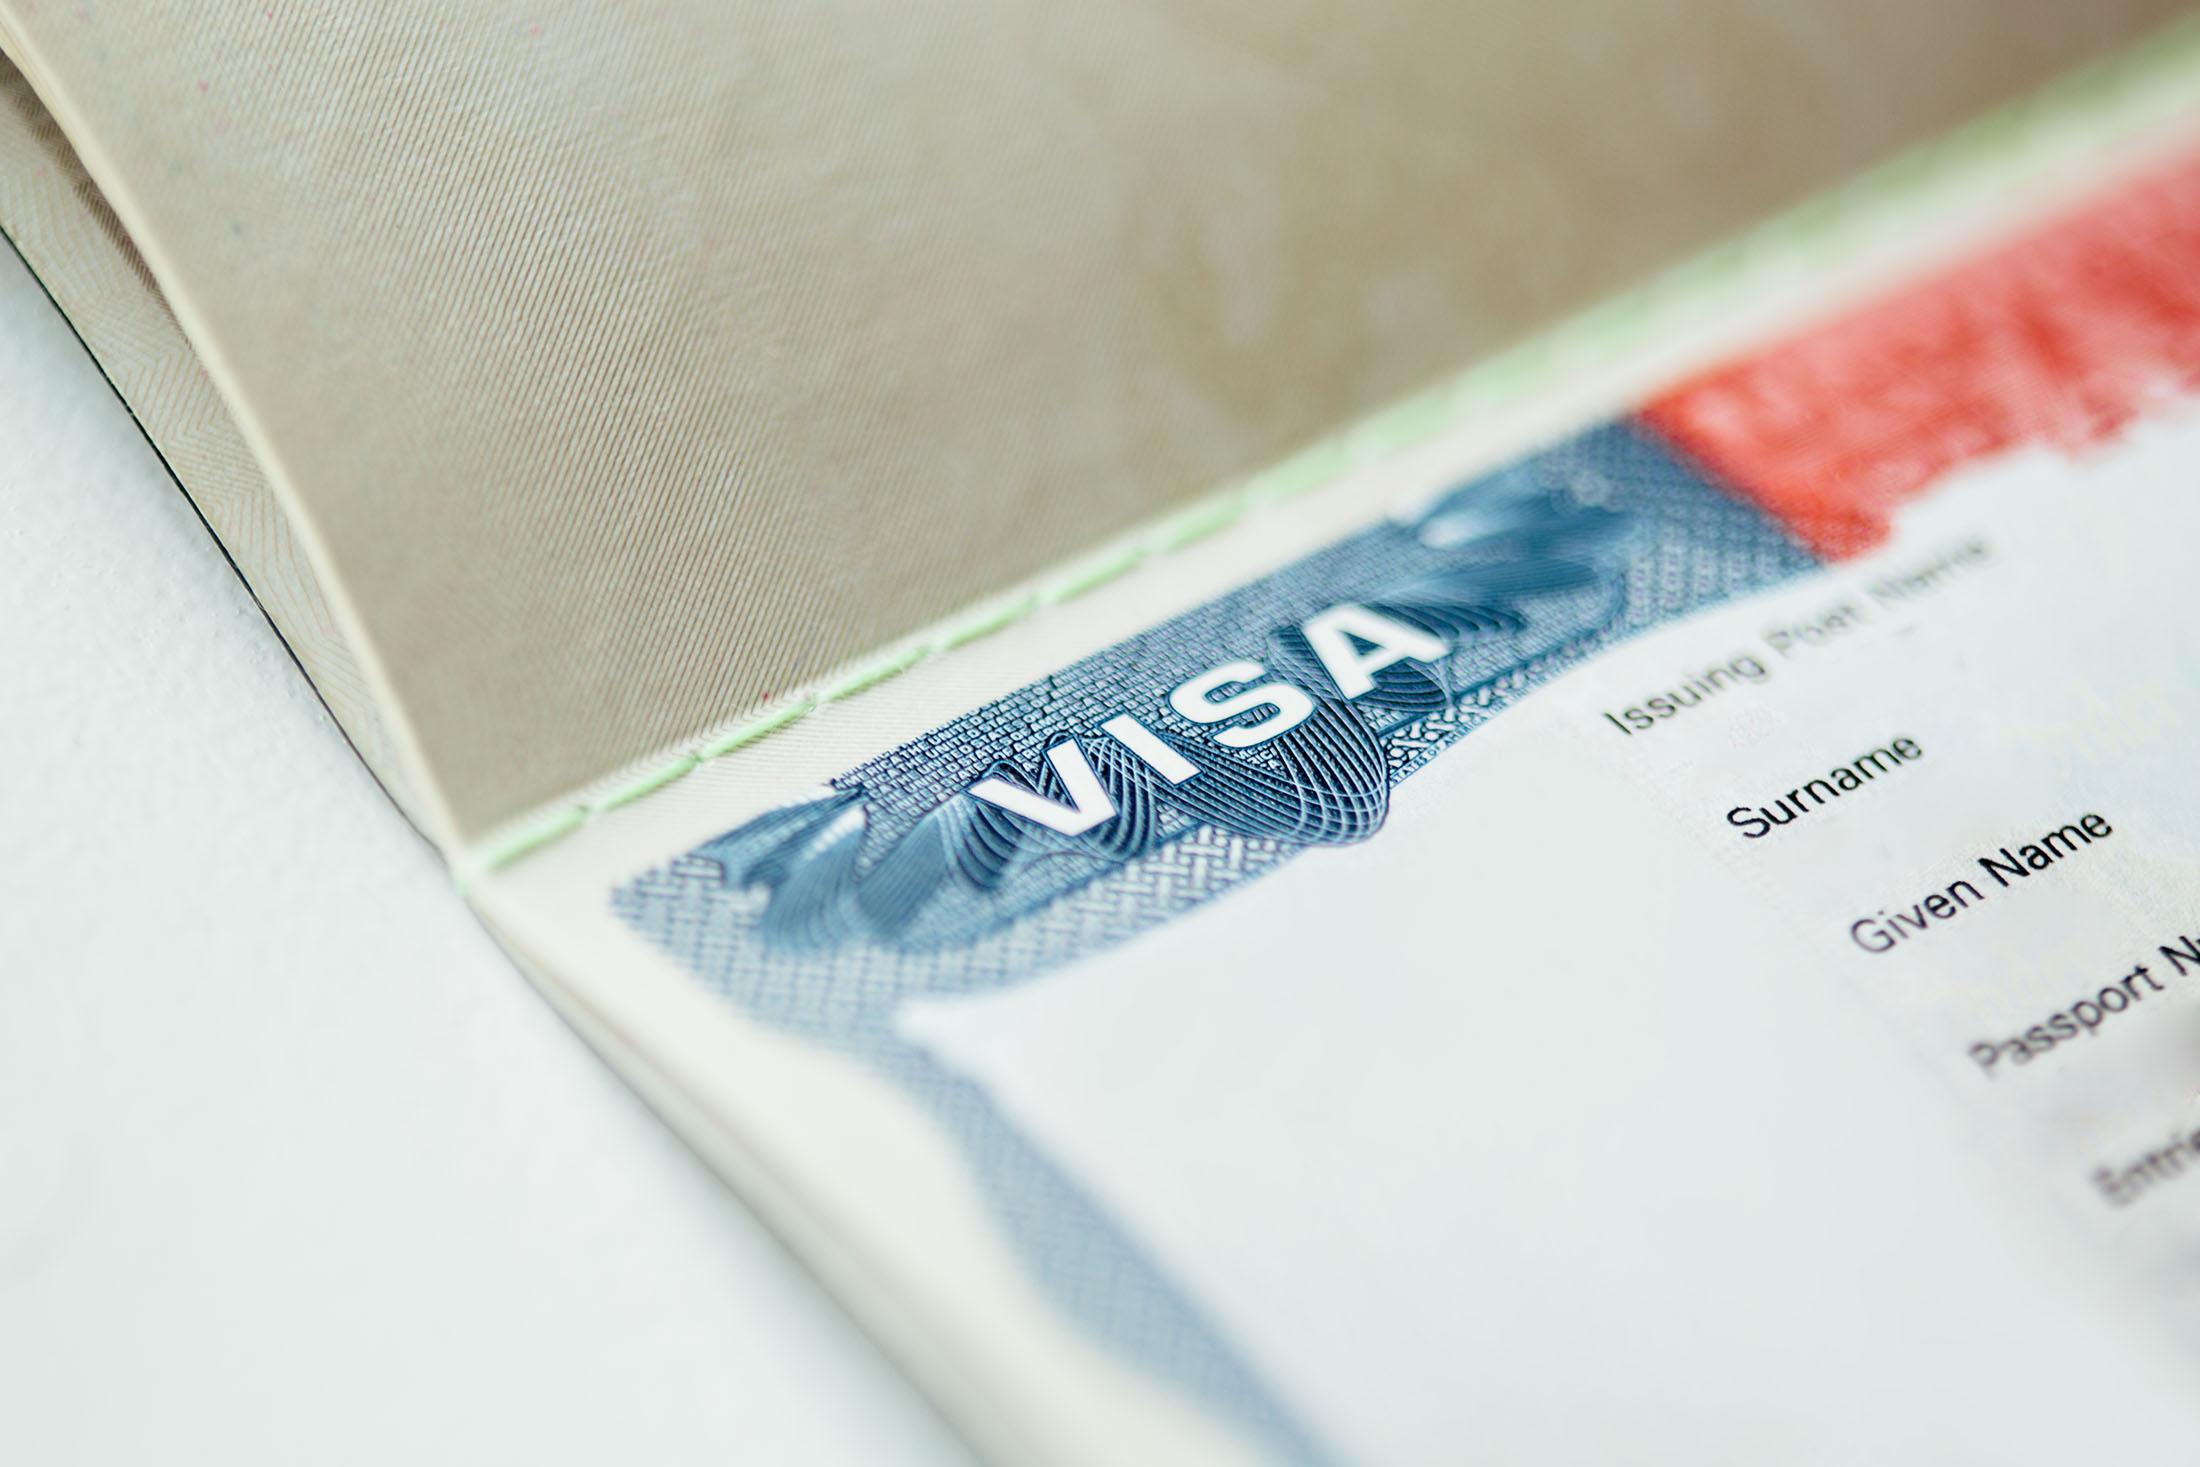 Only 10 People Have Applied for Obama-Era Startup Visa